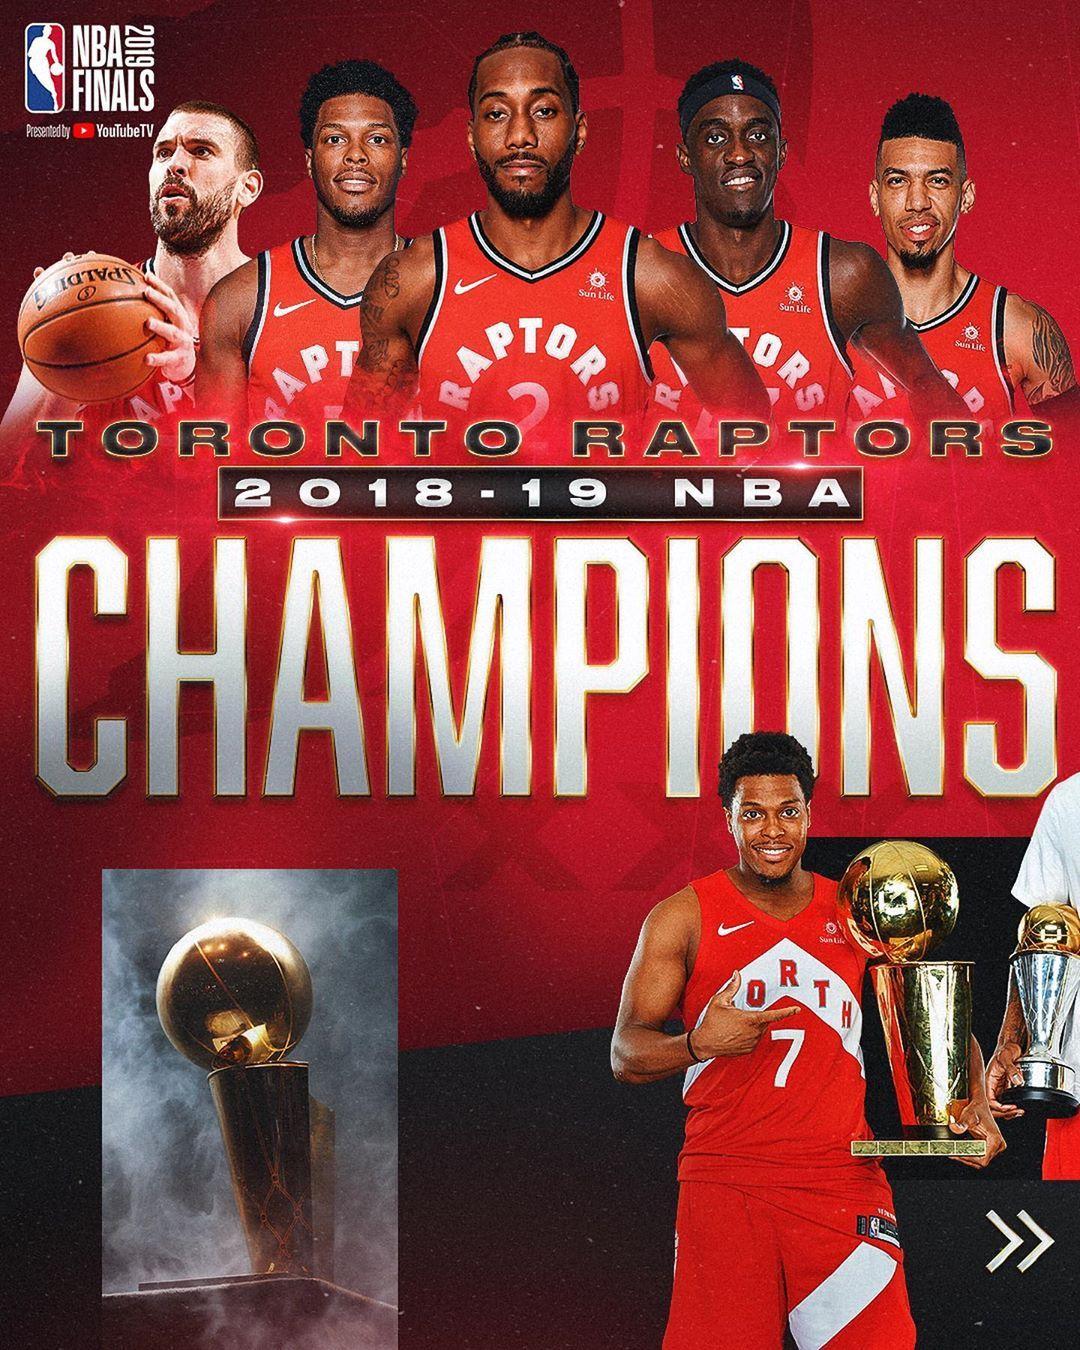 Nba Basketball Big4 Bigfour Big4 Bigfour Big4 Bigfour Nationalbasketballassociat Nba Champions Toronto Raptors Basketball Nba Pictures